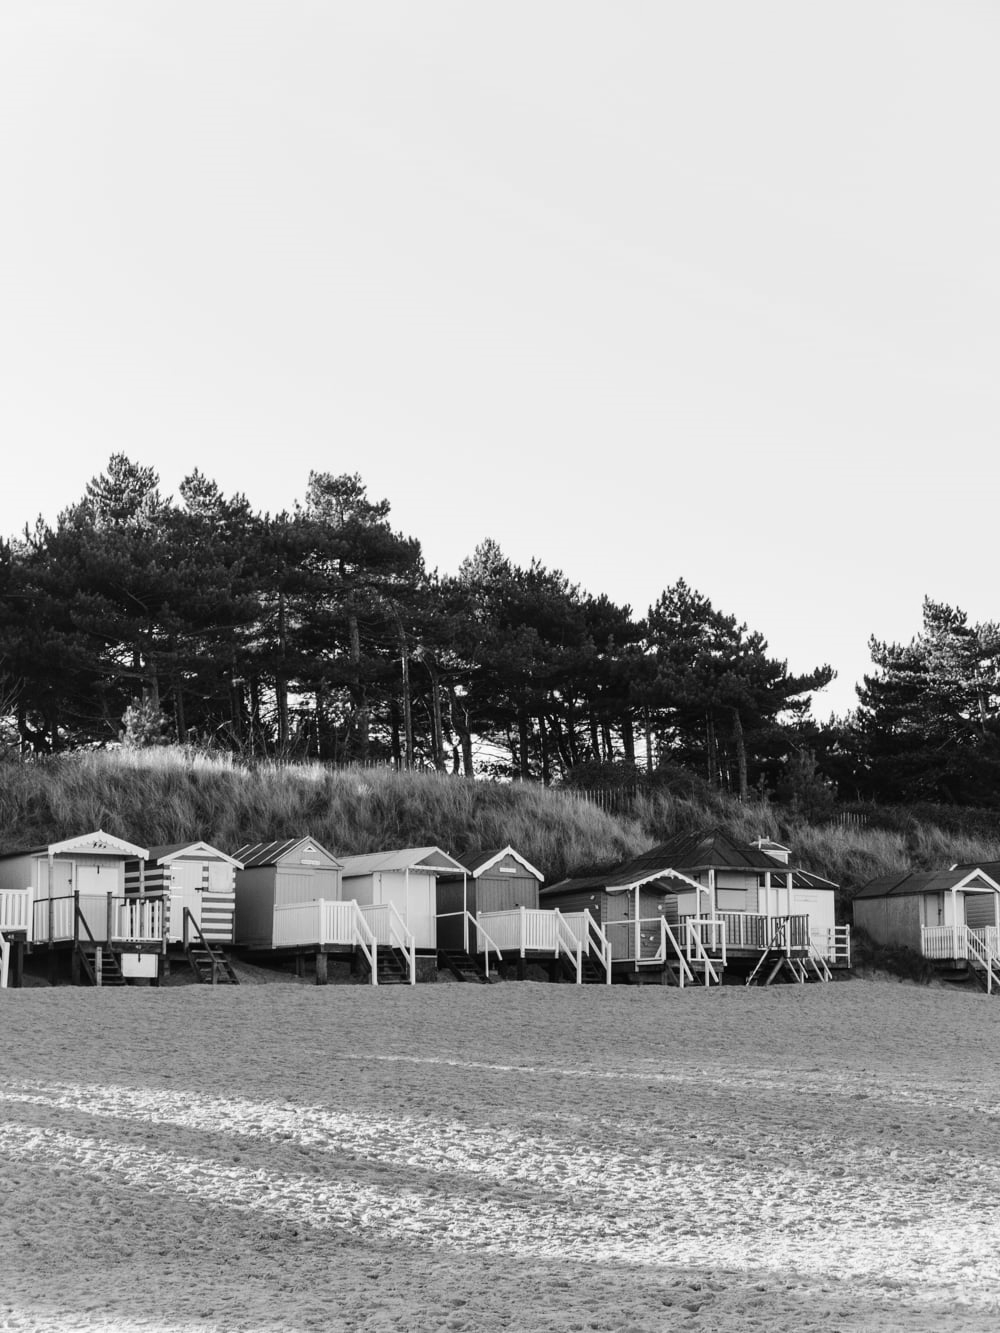 Haarkon Wells Wells-next-the-sea Coast Norfolk architecture beach huts pine woods